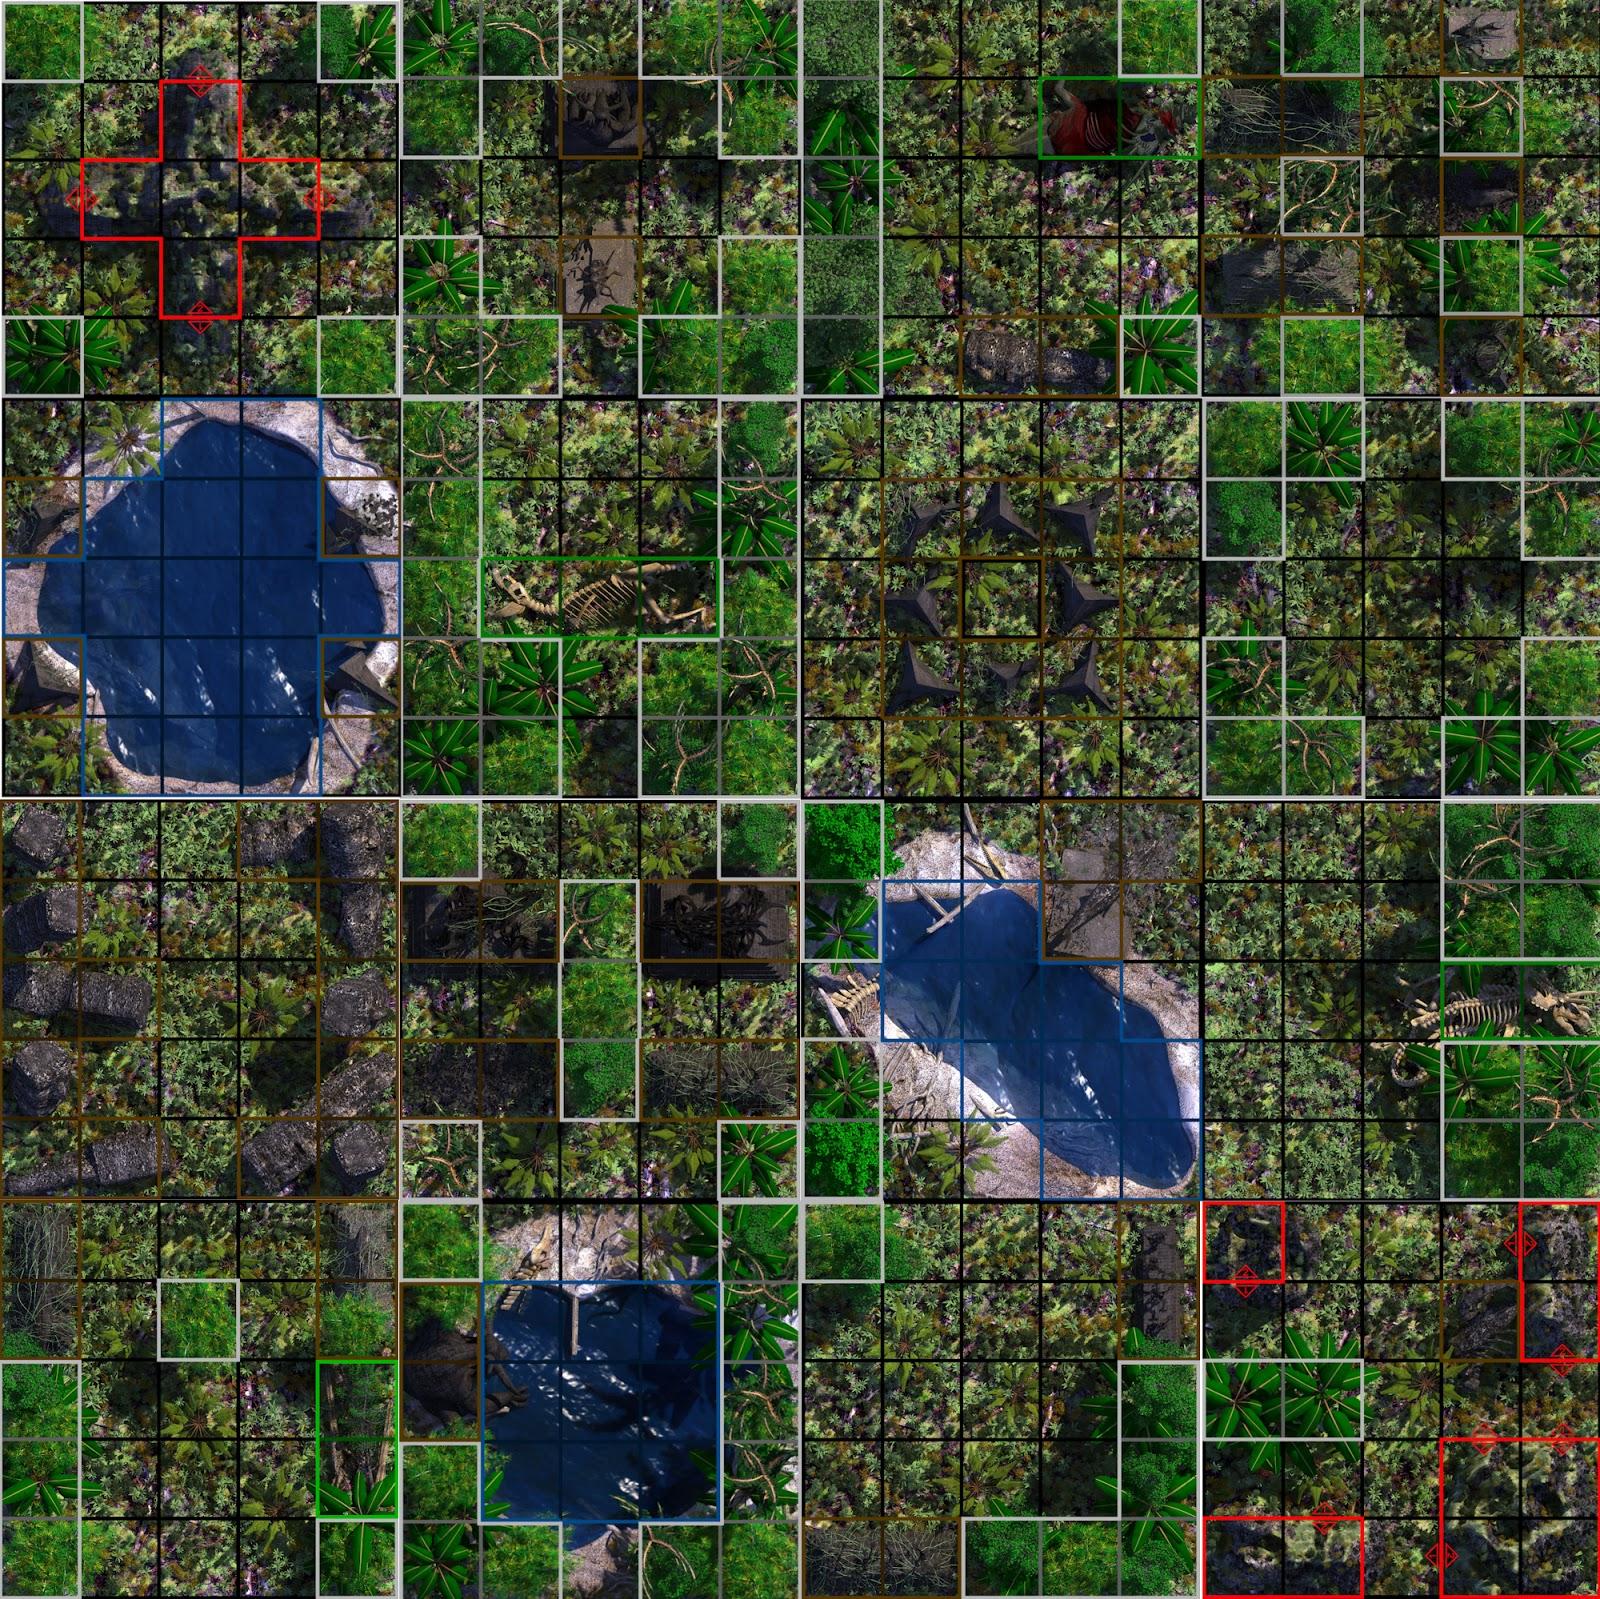 Heroclix Maps - Printable Heroclix Maps